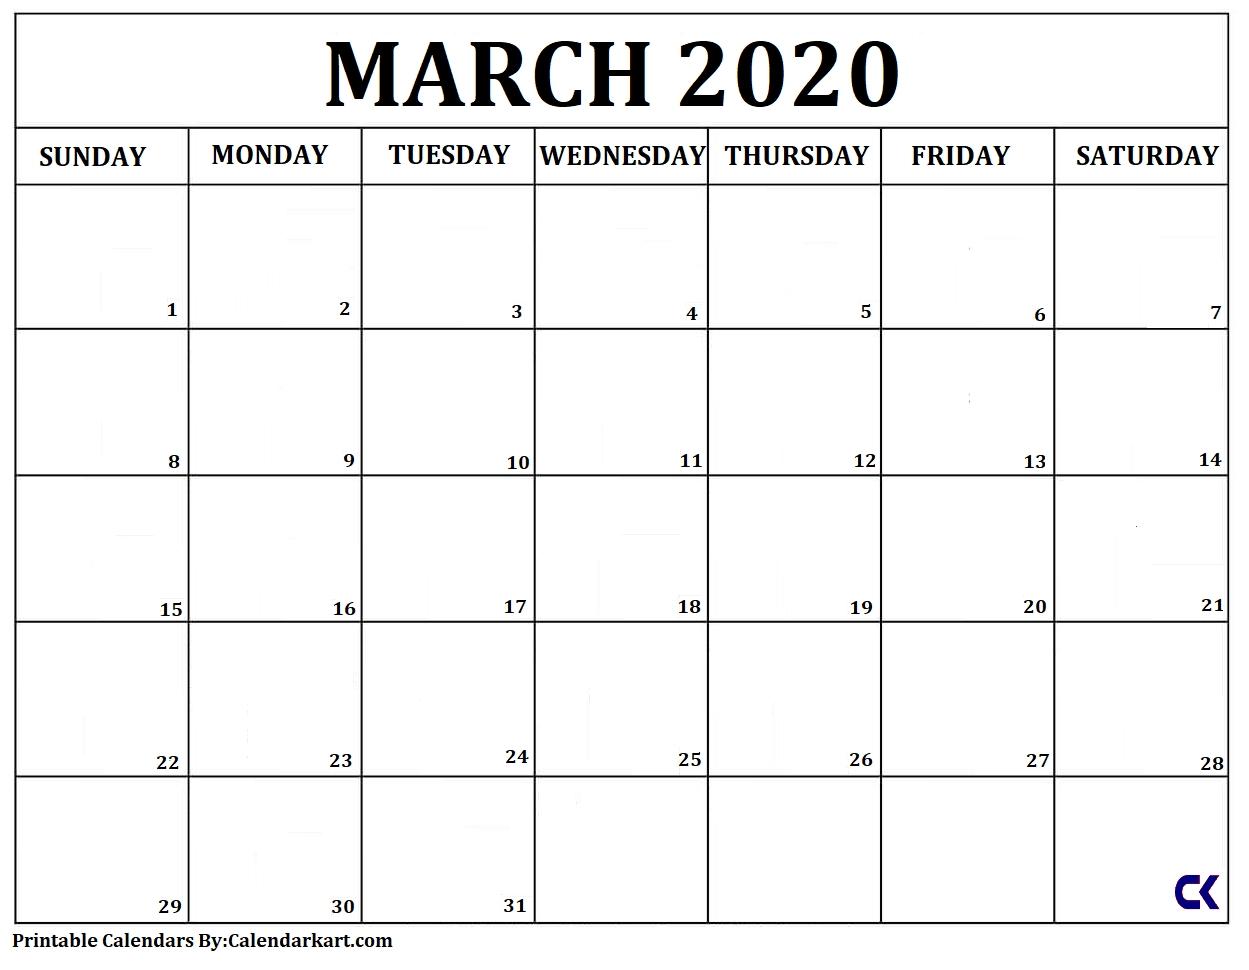 Free Printable Calendar Templates 2020 » Calendarkart  Calendar Template 2020 Printable Free